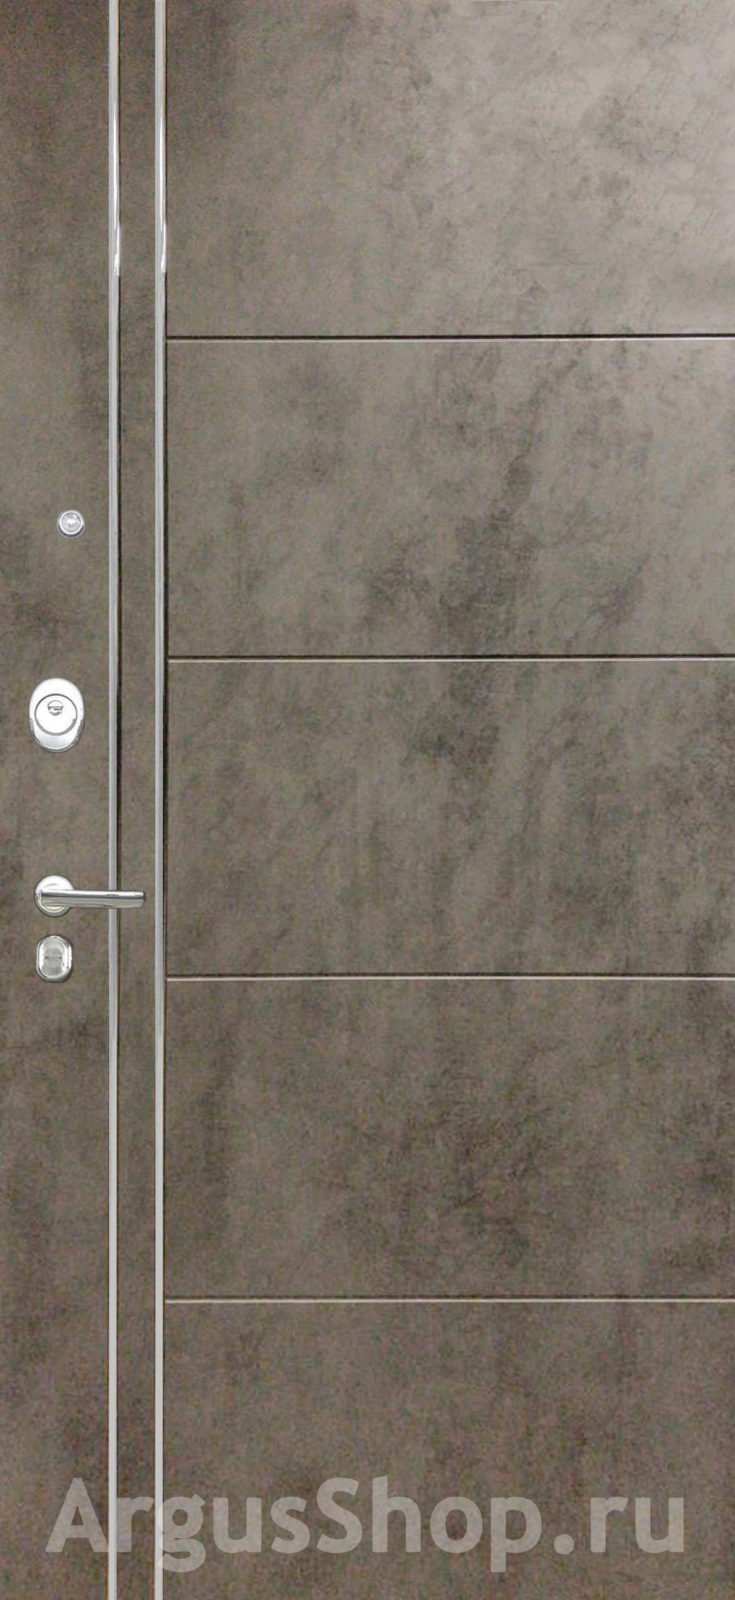 Двери Аргус Лофт Тёмный бетон